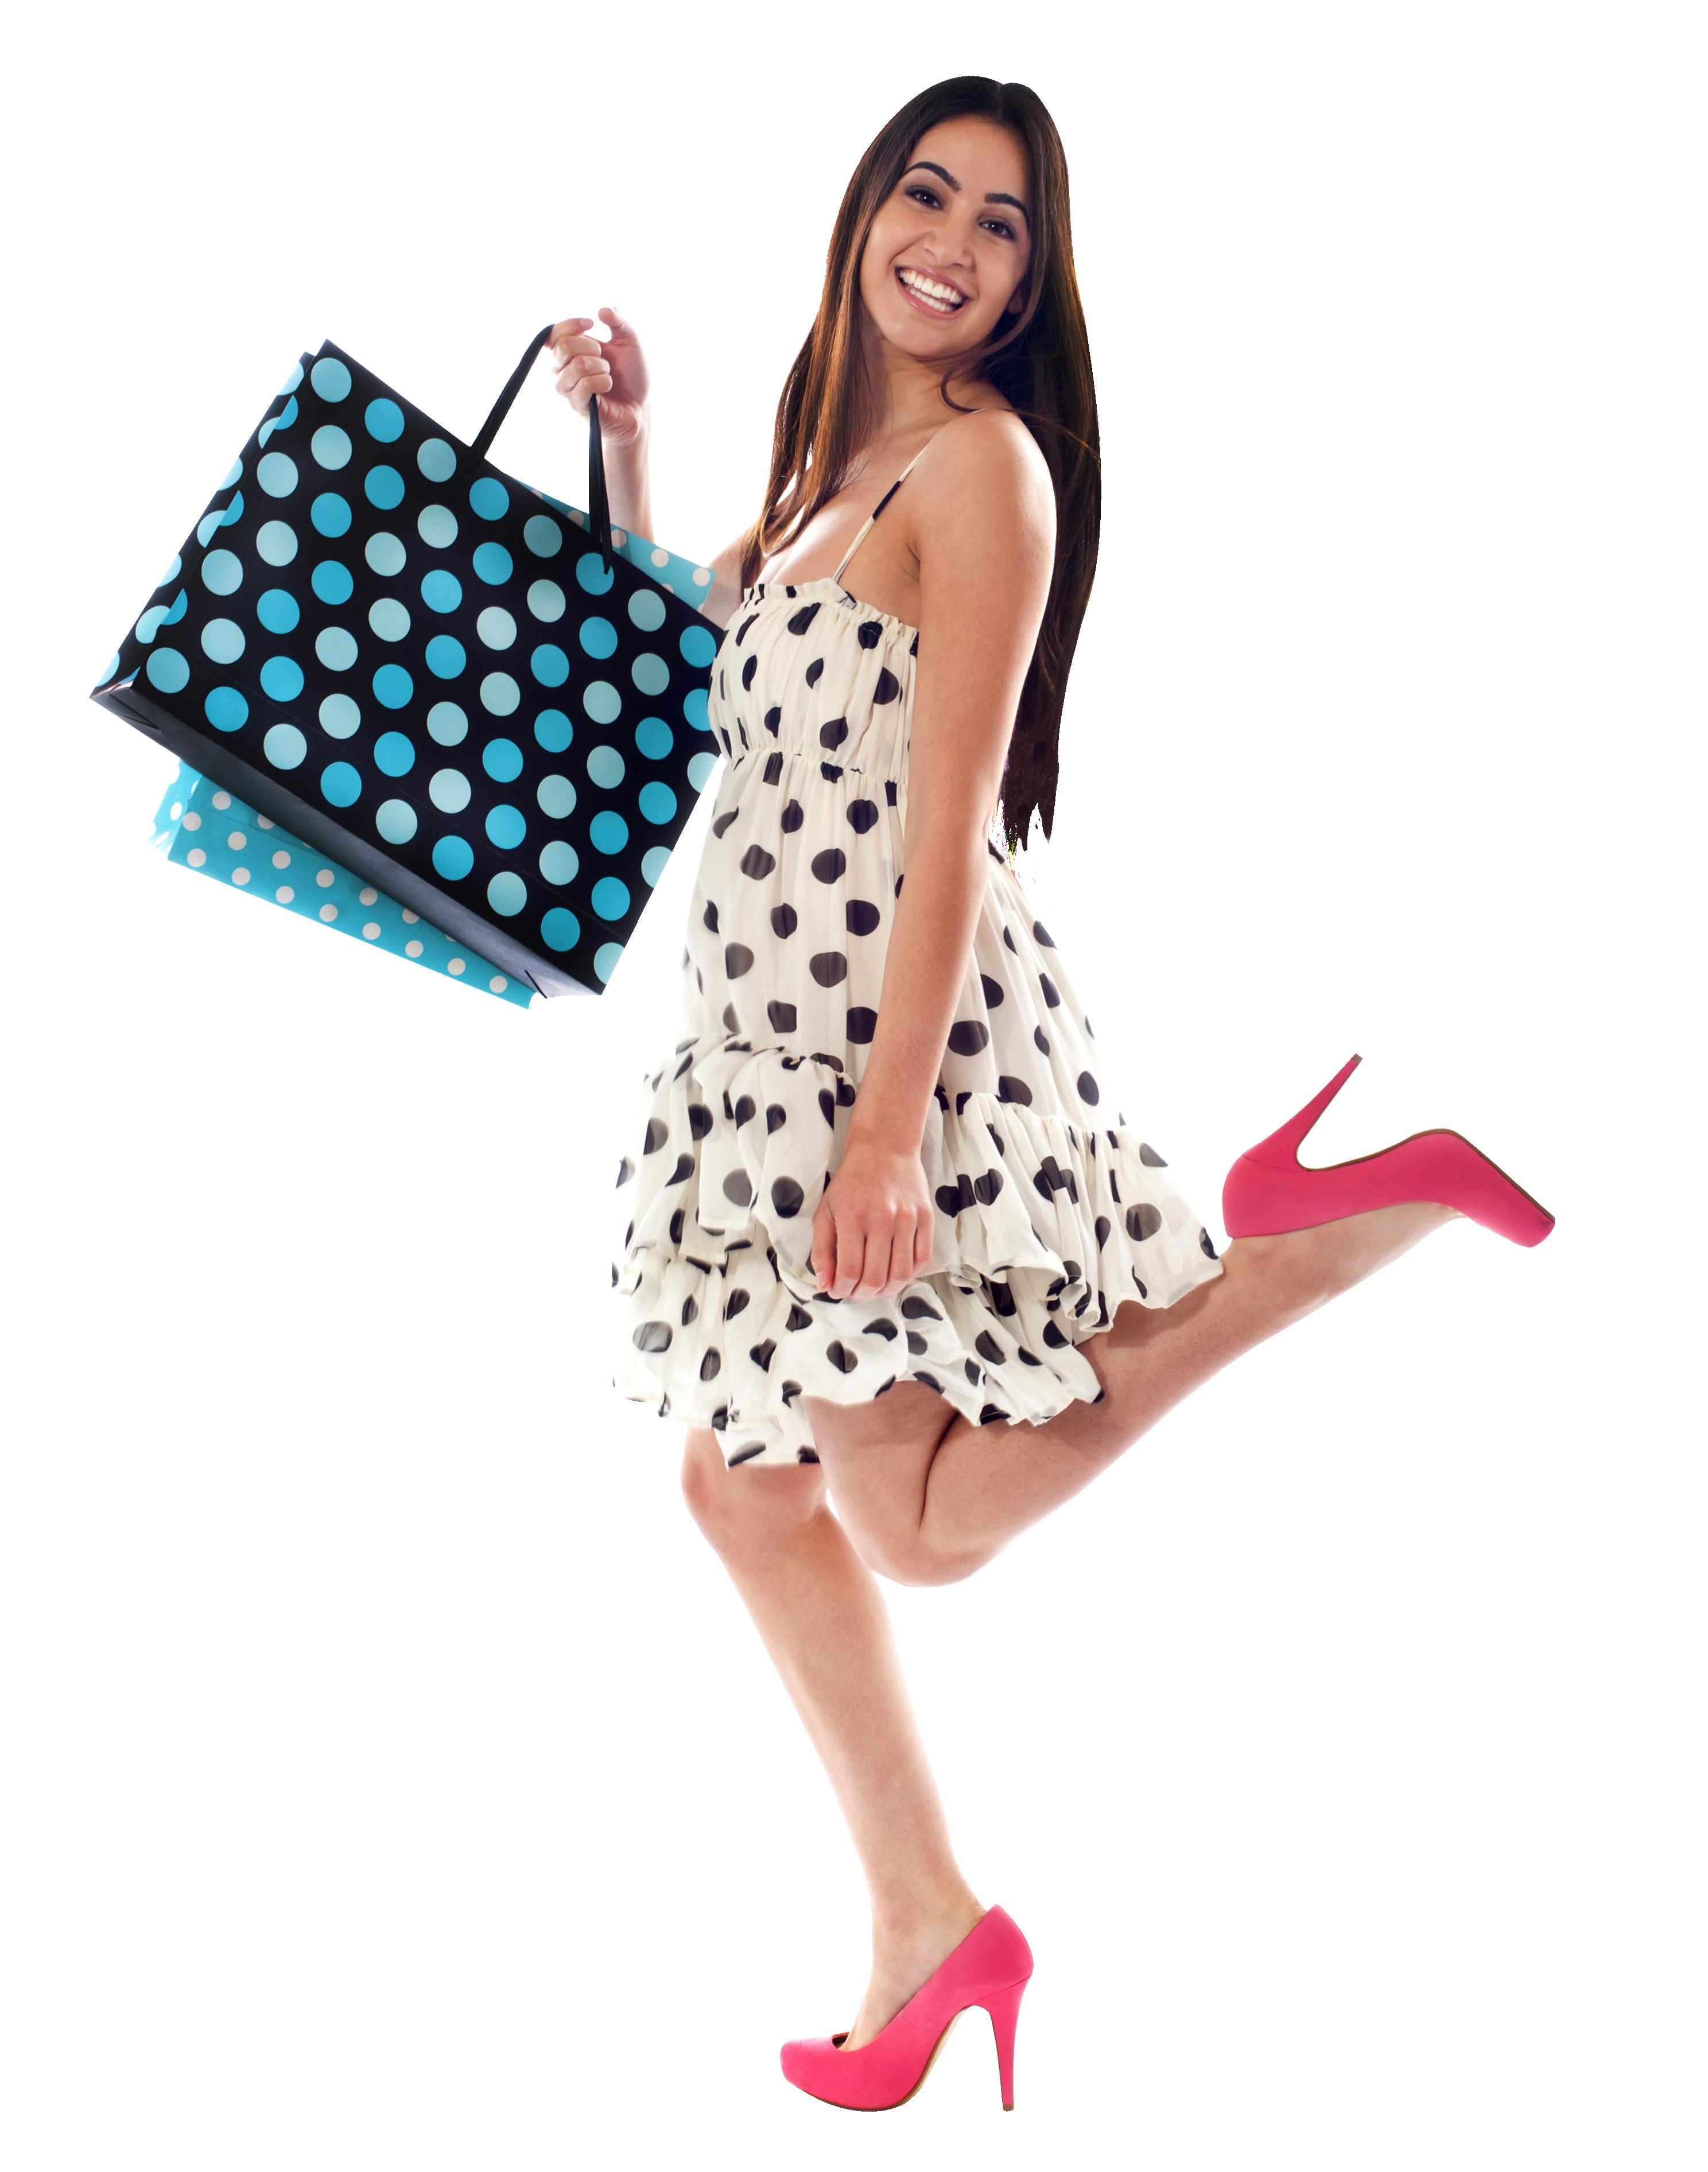 Women Shopping Png Image Purepng Free Transparent Cc0 Png Image